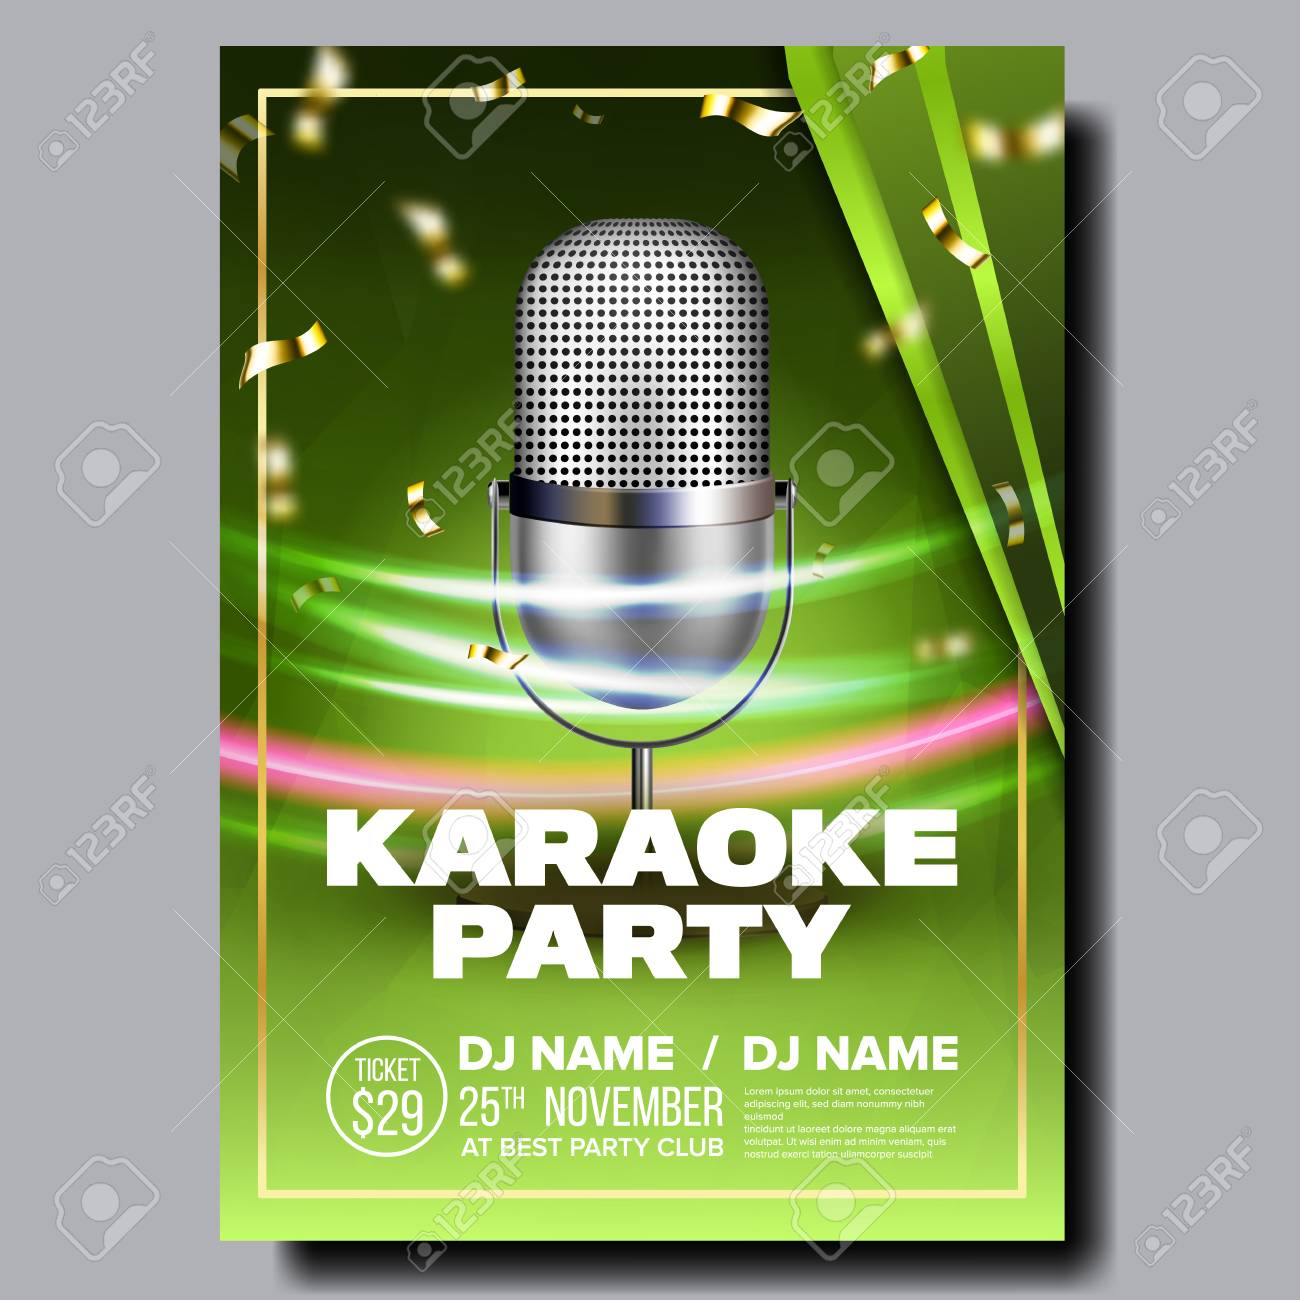 Karaoke Poster Vector  Sing Song  Karaoke Dance Event  Vintage